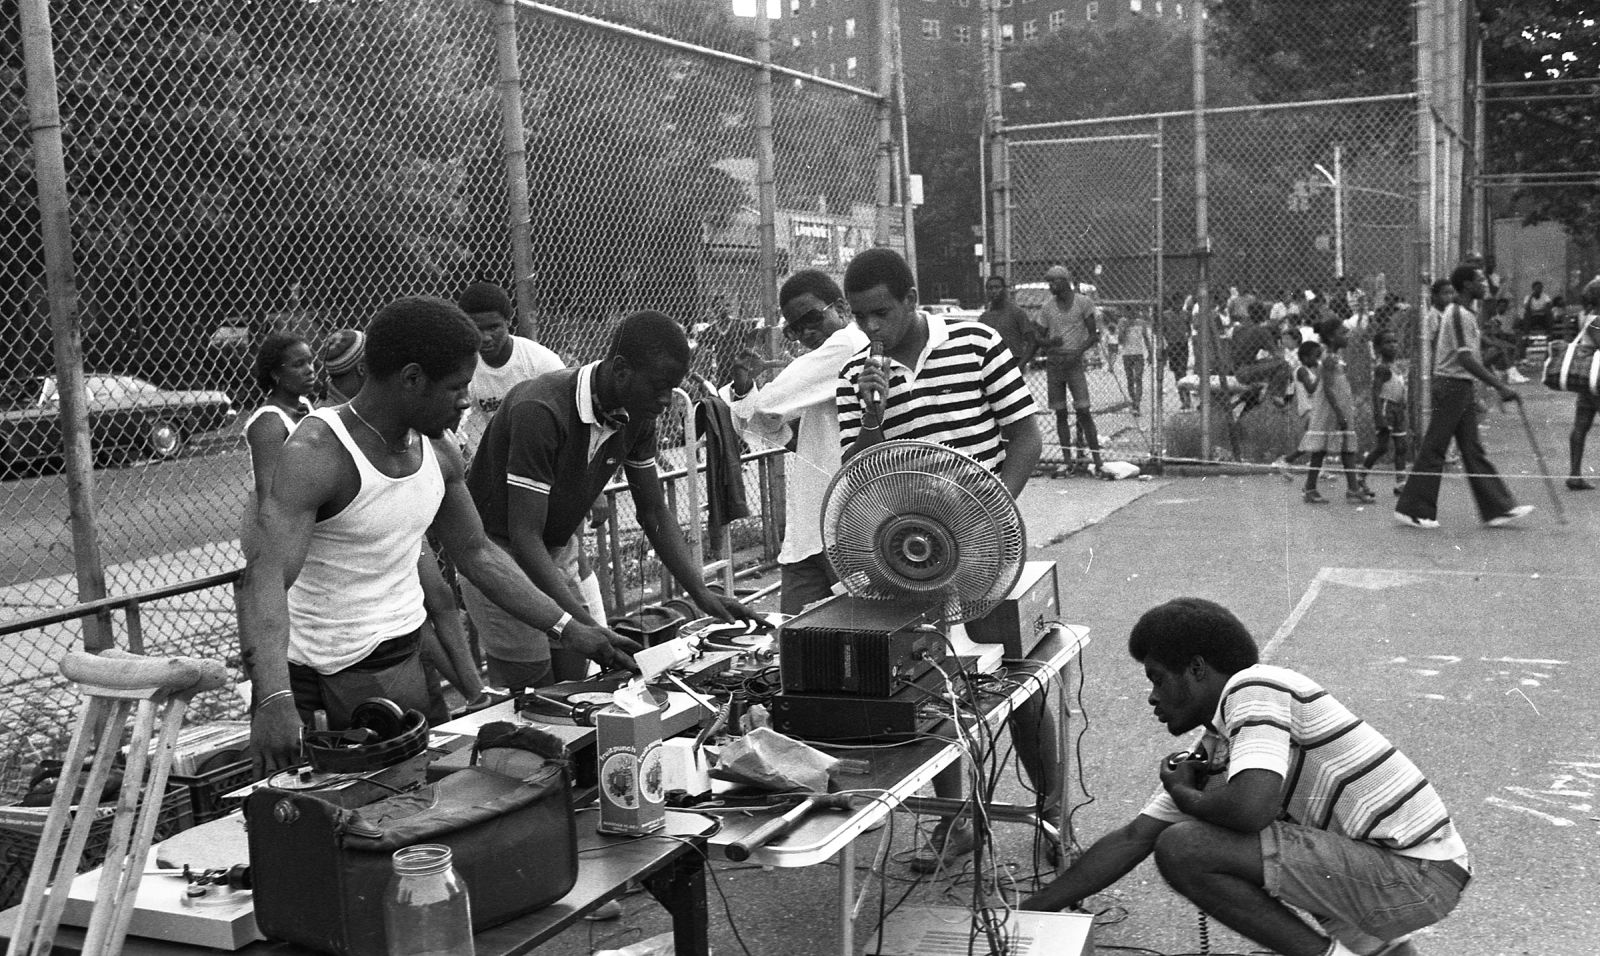 A classic rapper and DJ set at a Bronx a park, taken by legendary hip-hop photographer Henry Chalfant. (Photo Credit: http://henrychalfant.com)